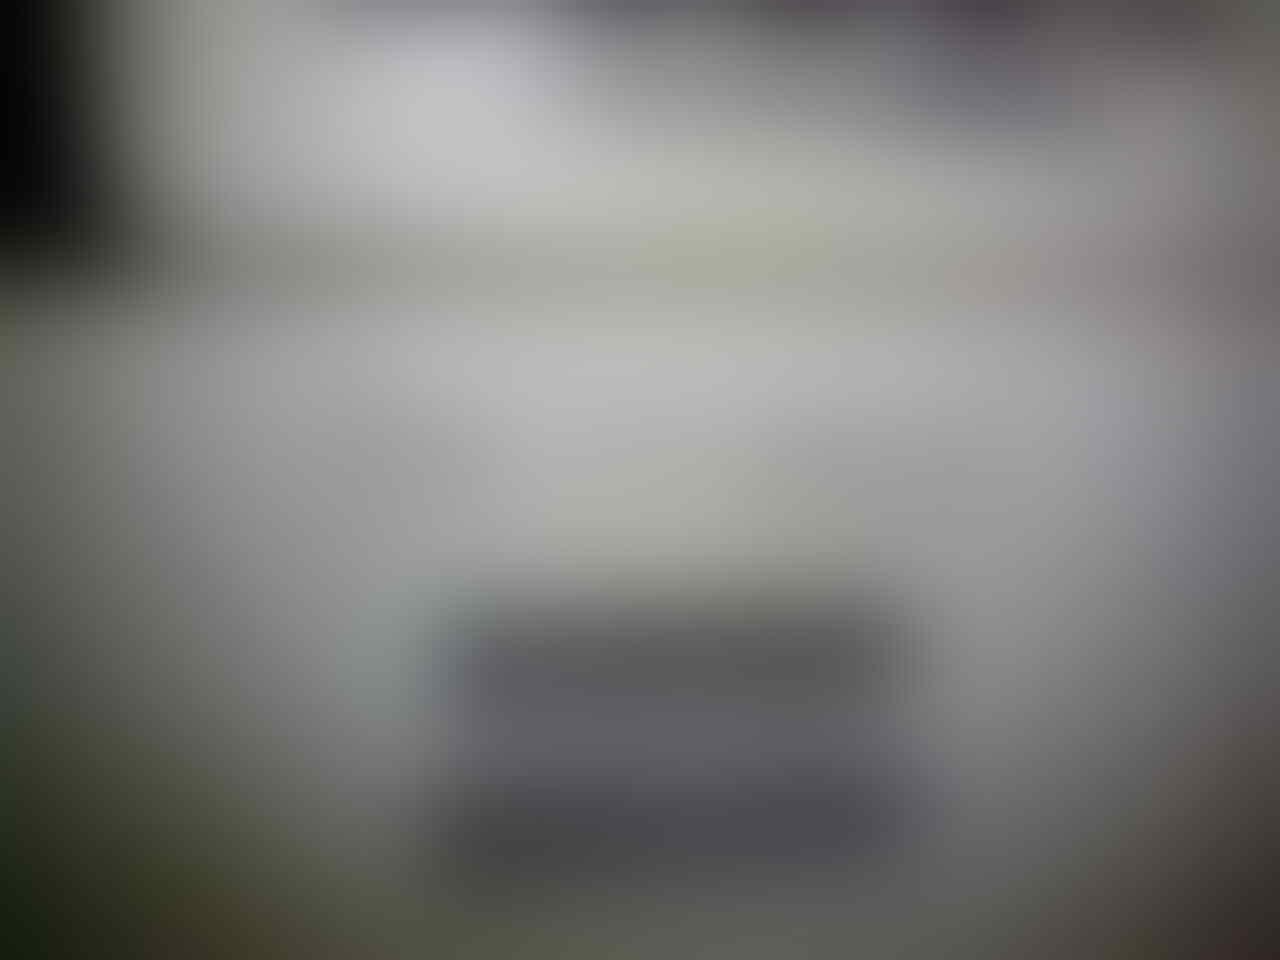 PS3 SLIM 160GB CFW 4.55 CECH 2506A CLASSIC WHITE